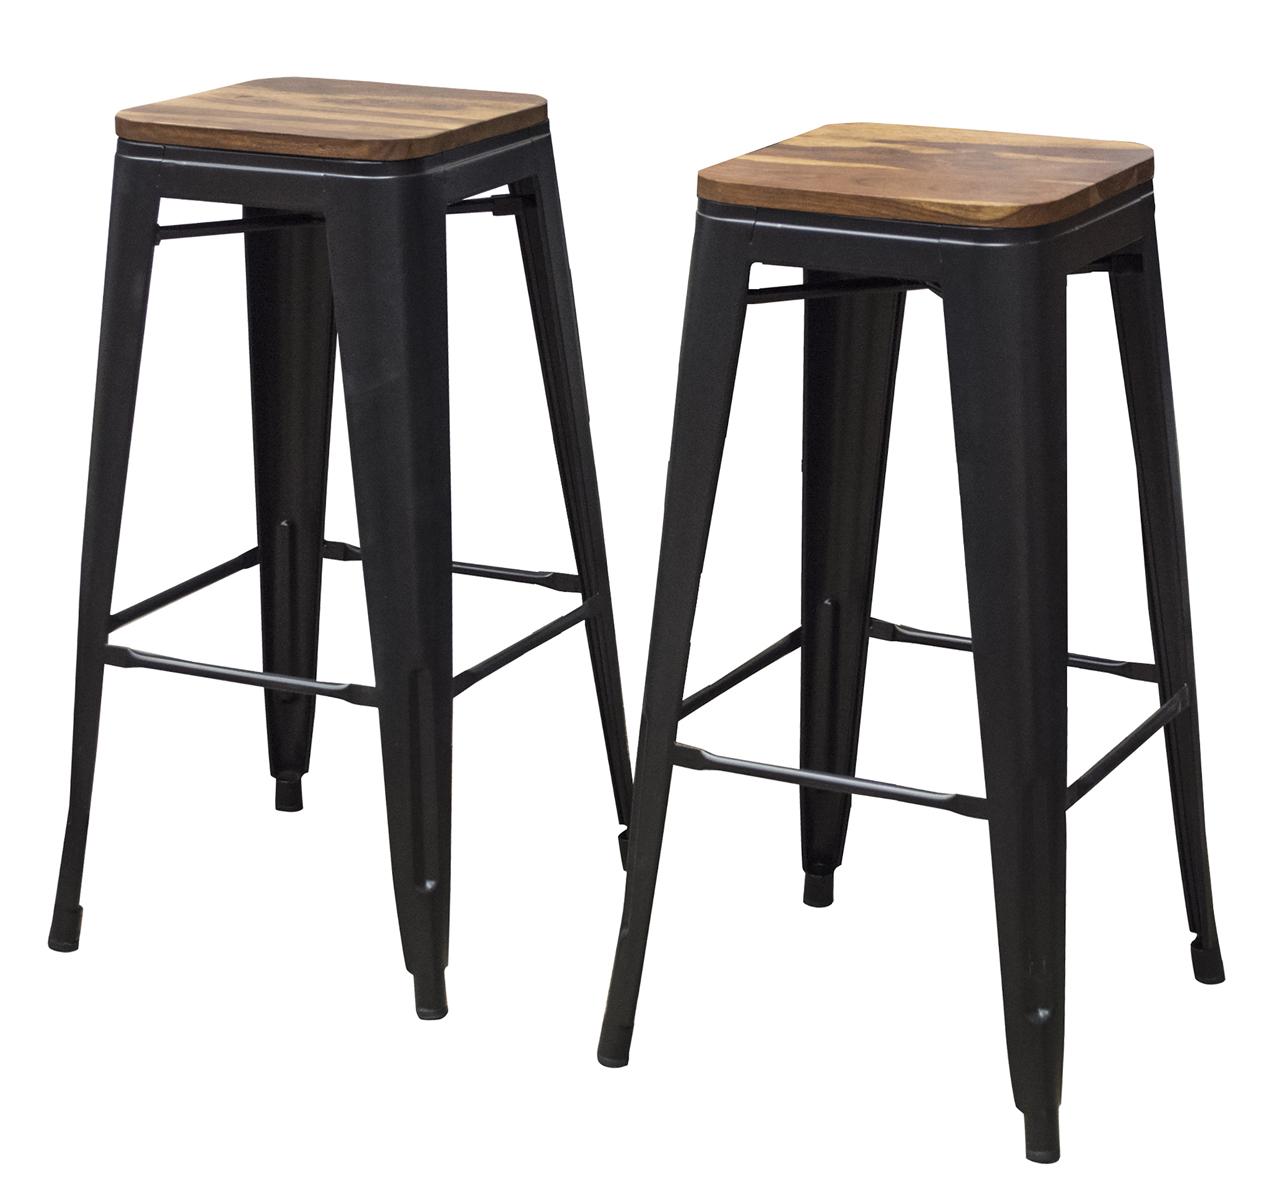 "2 Piece 30"" Bar Stool Set with Rosewood Top and Metal Legs"